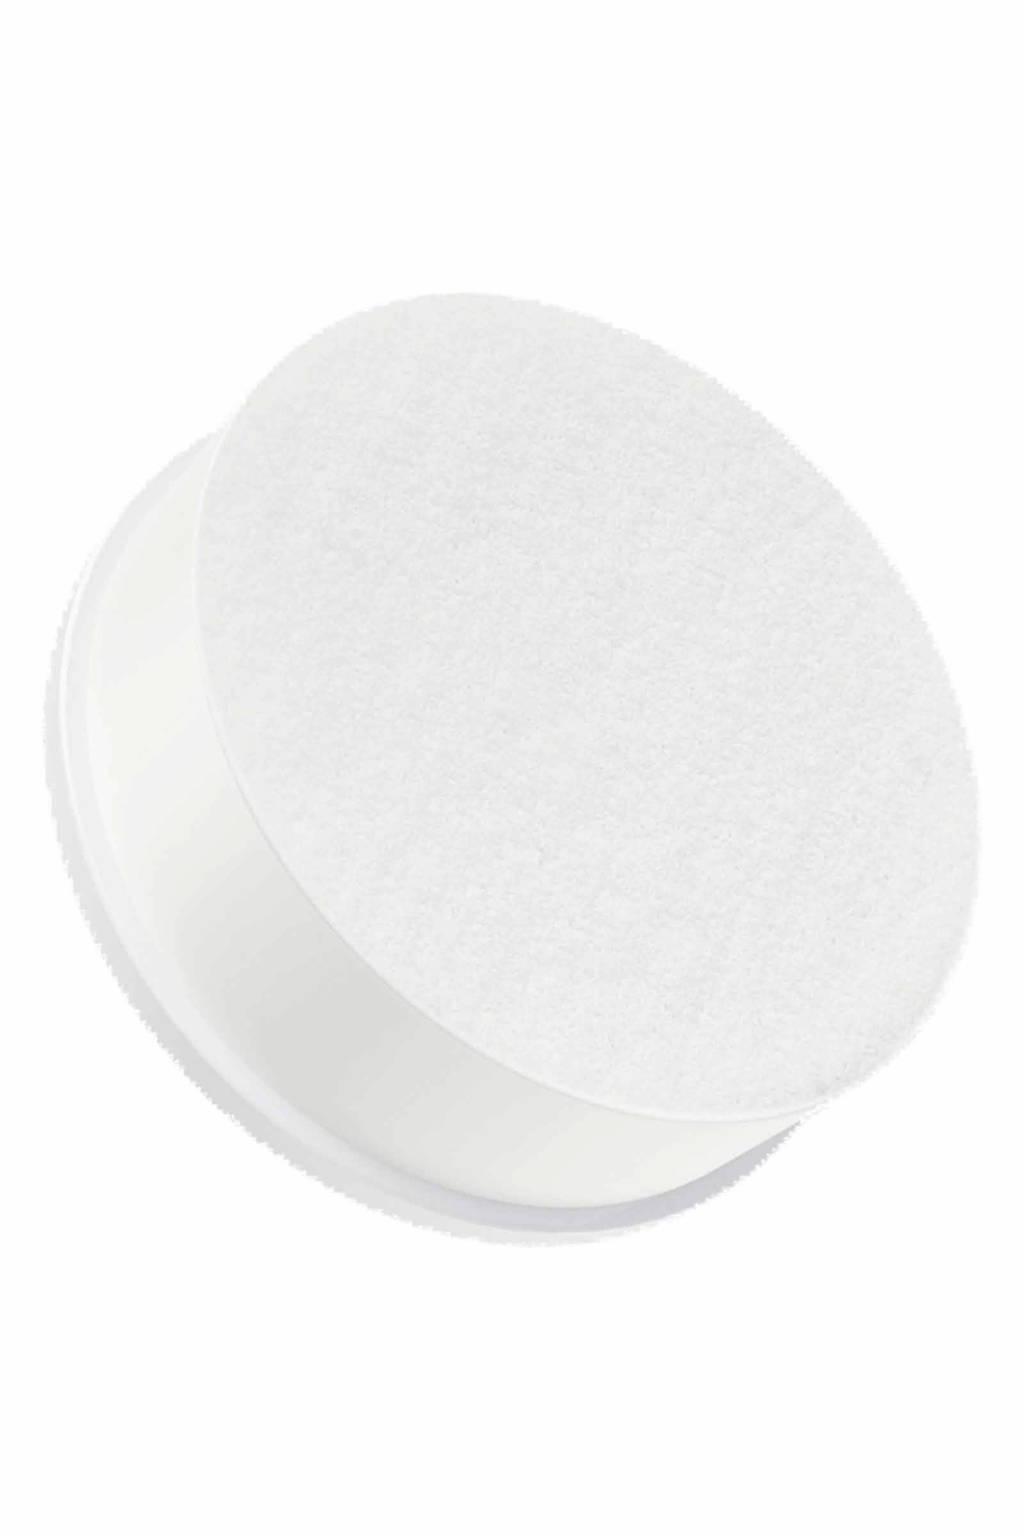 Braun Face SE80b opzetborstels - beauty spons